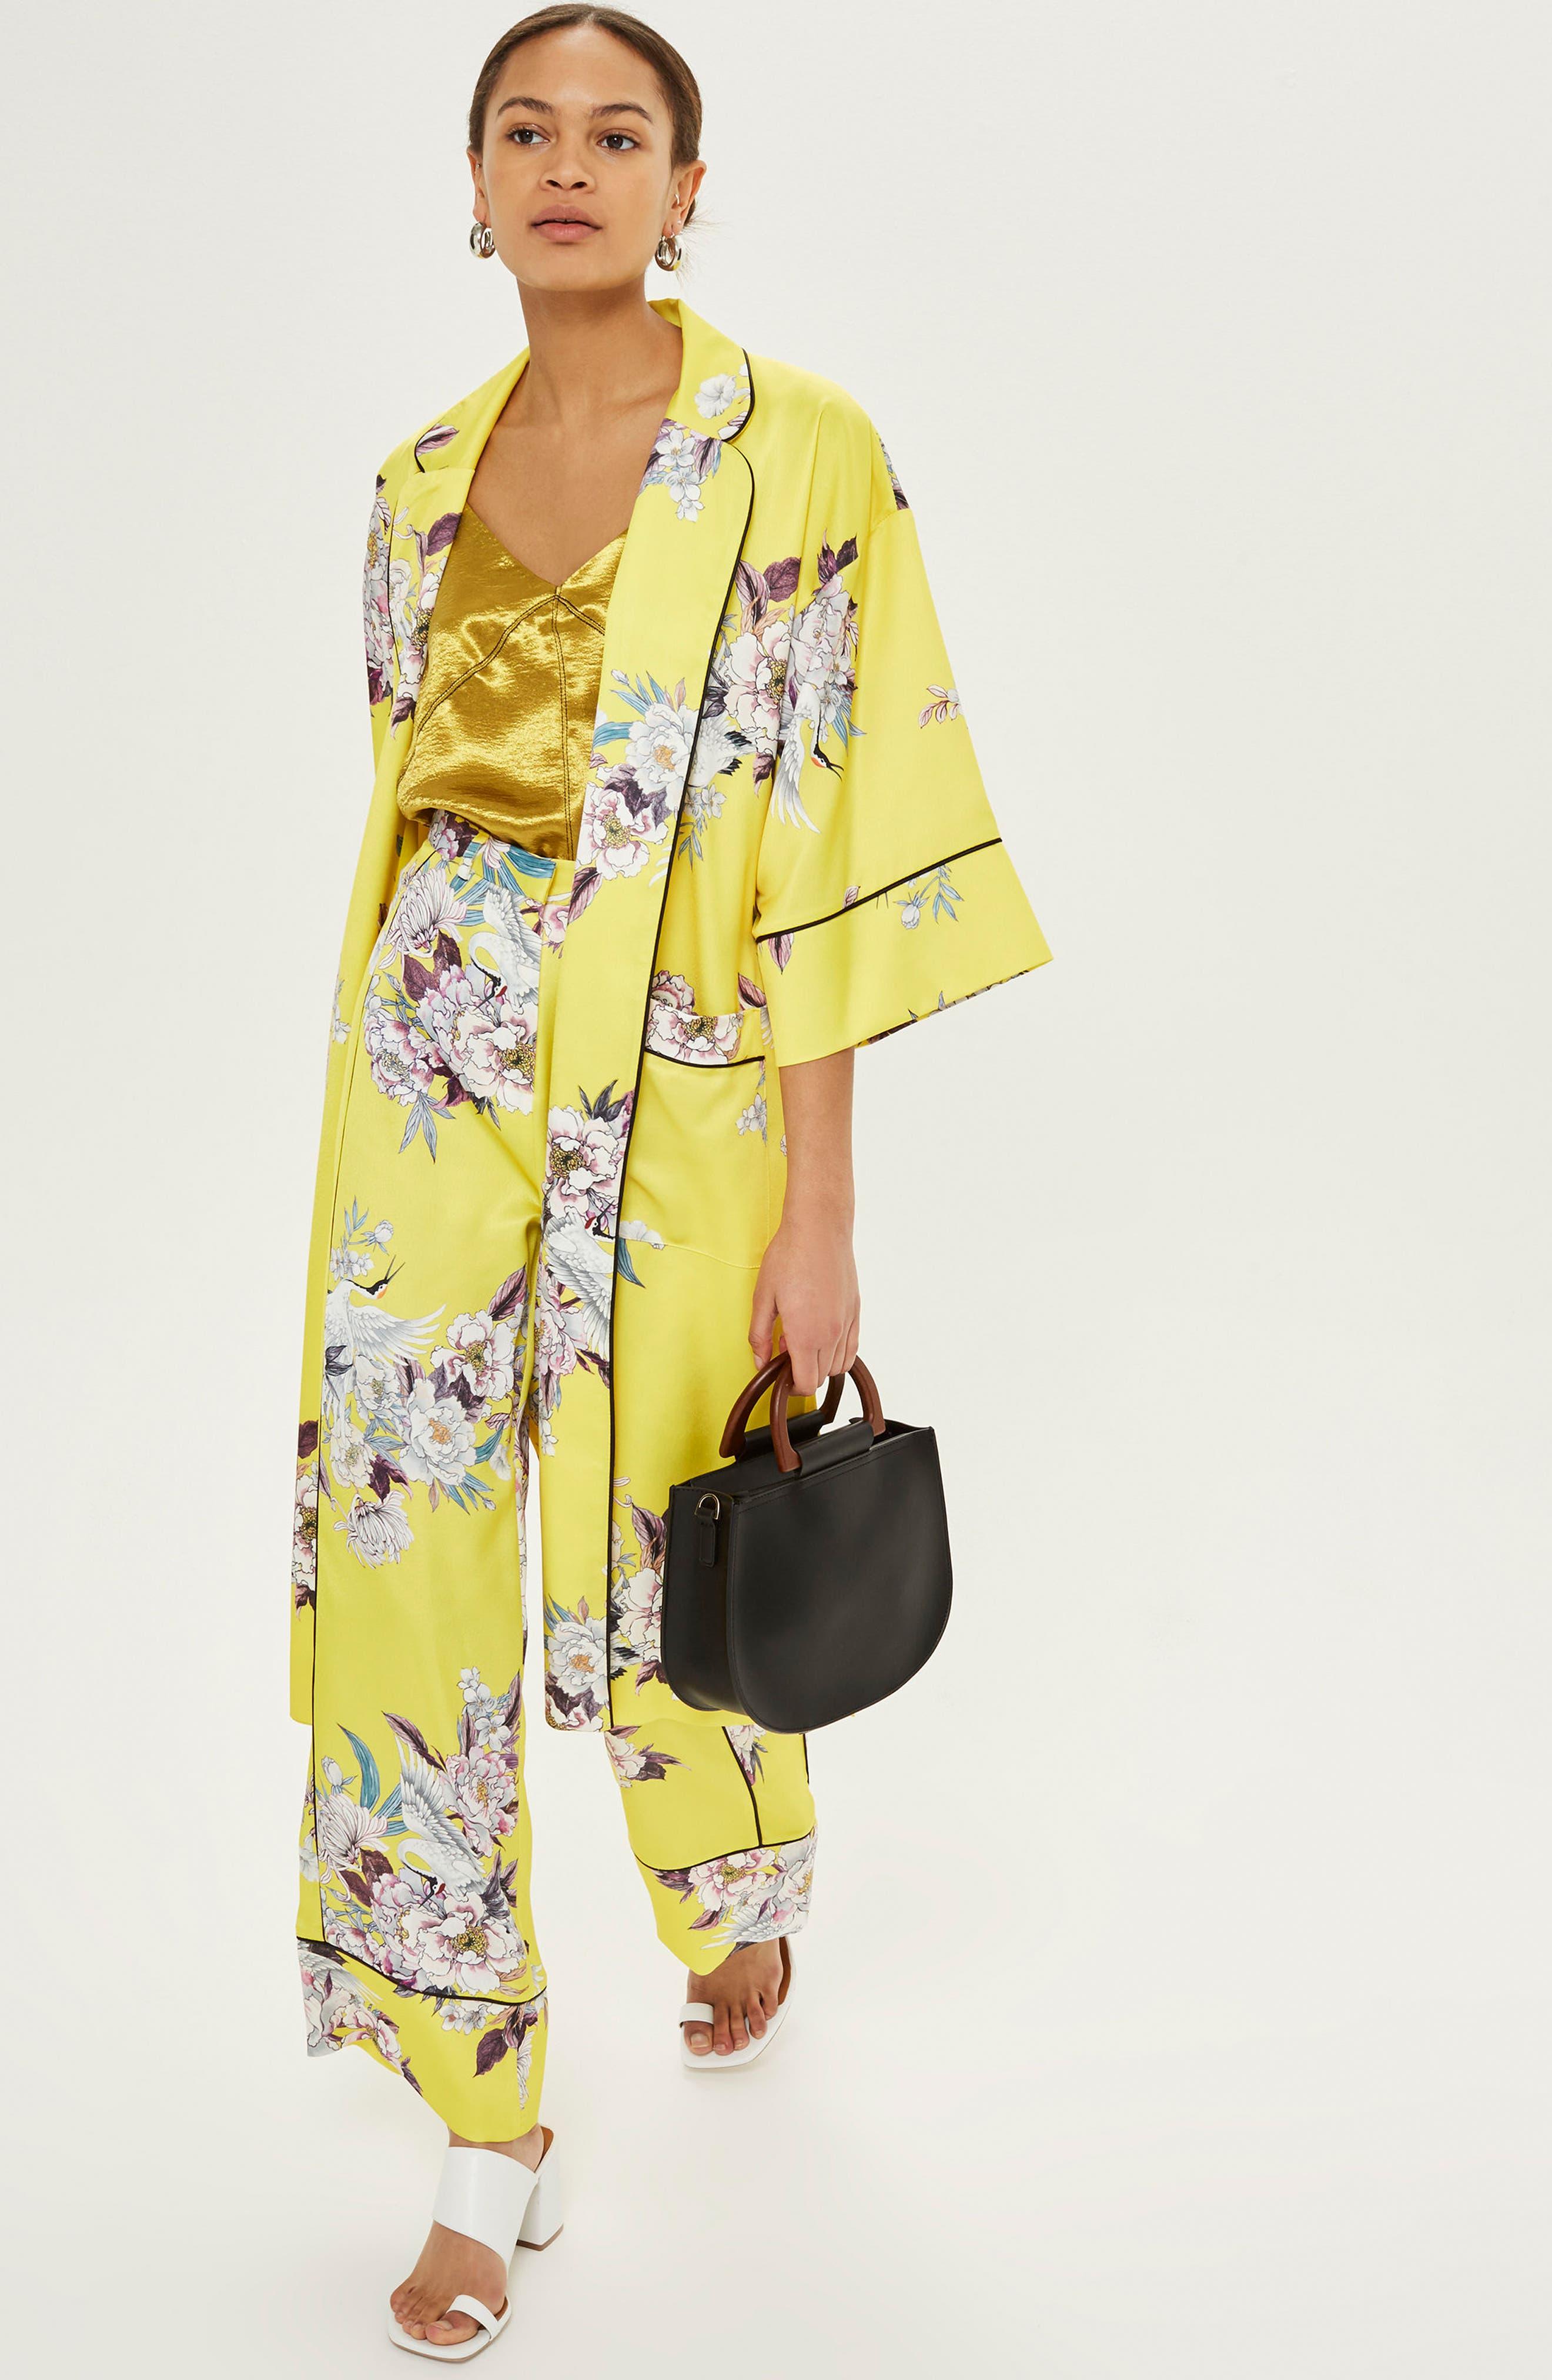 Heron Pajama Wide Leg Trousers,                             Alternate thumbnail 2, color,                             Yellow Multi